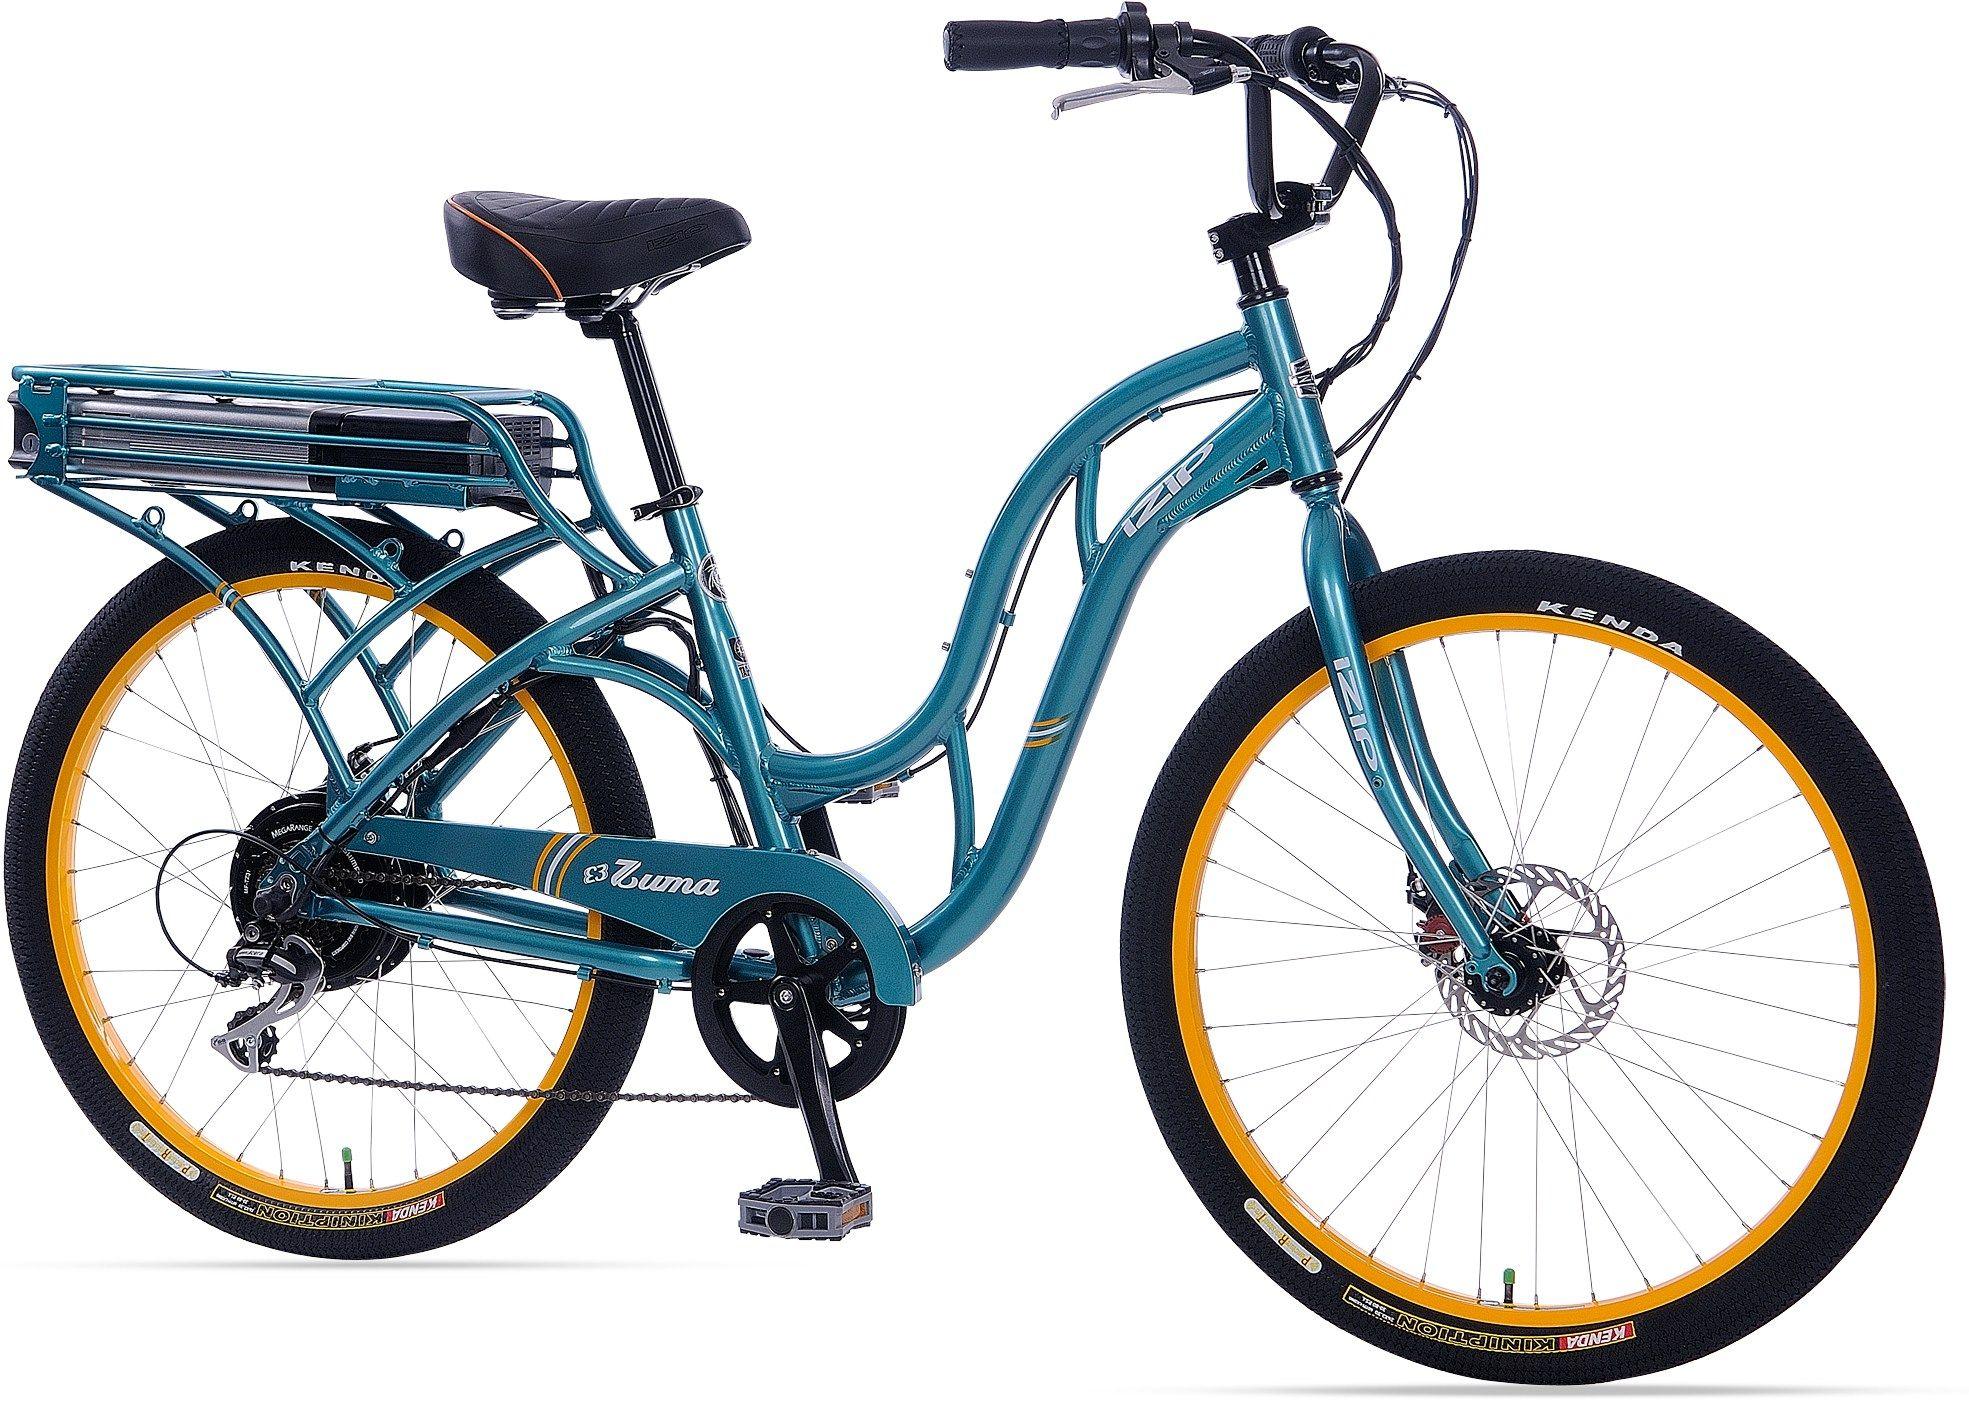 Currie Izip E3 Zuma Lsf Bike 2013 At Rei Com Bike Electric Bike Rei